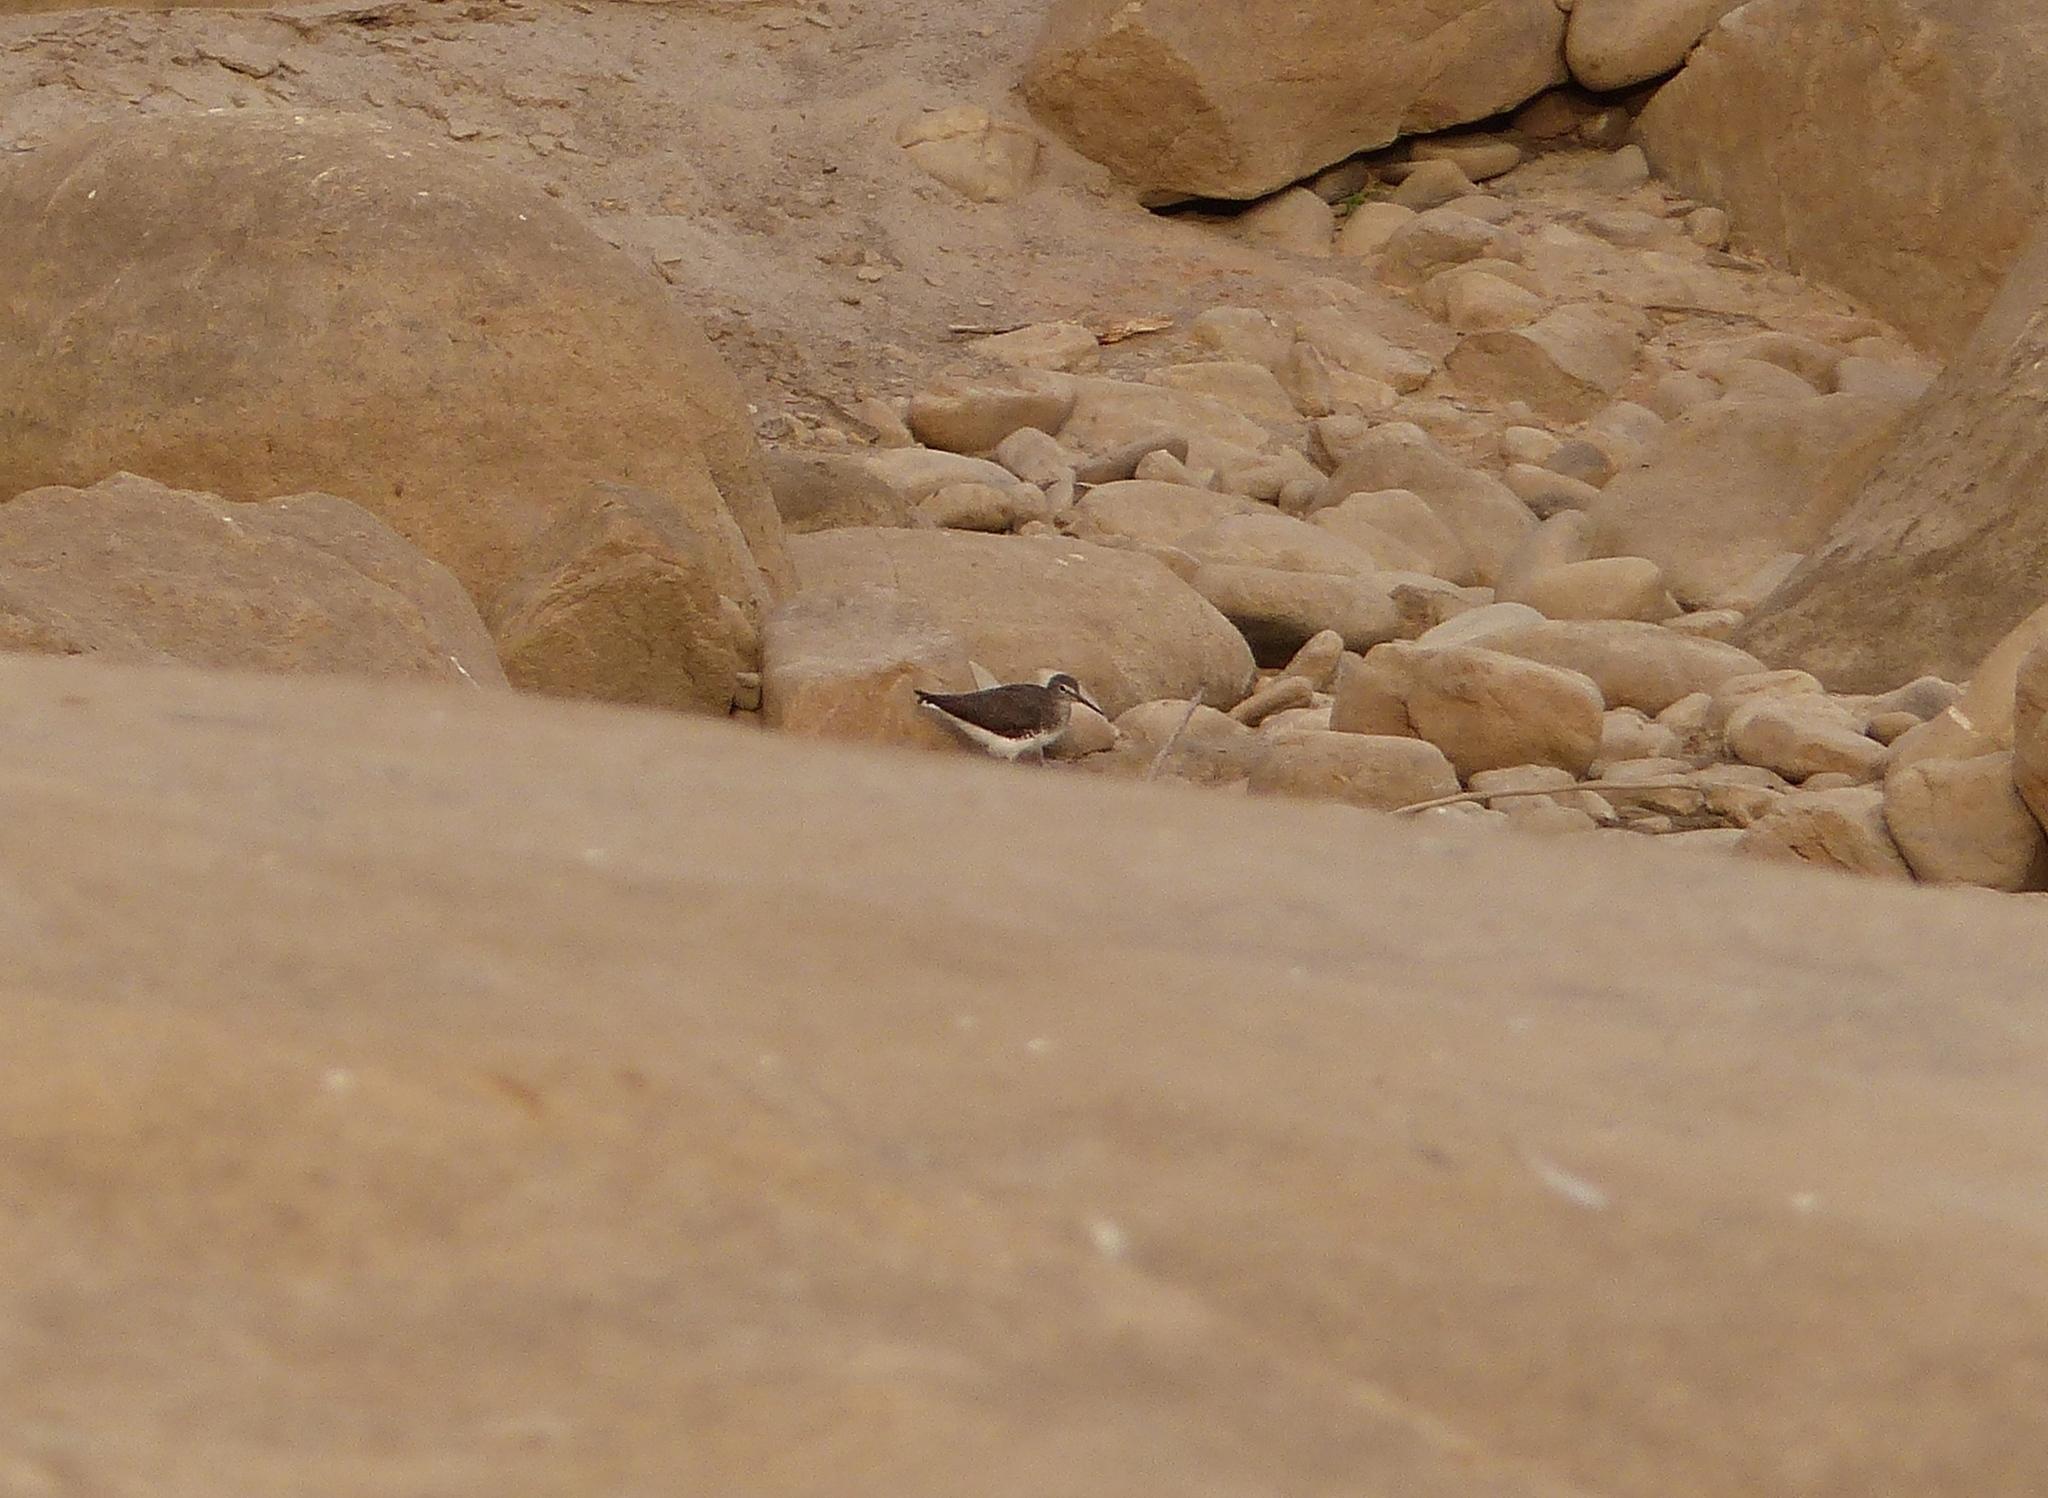 Image of Green sandpiper